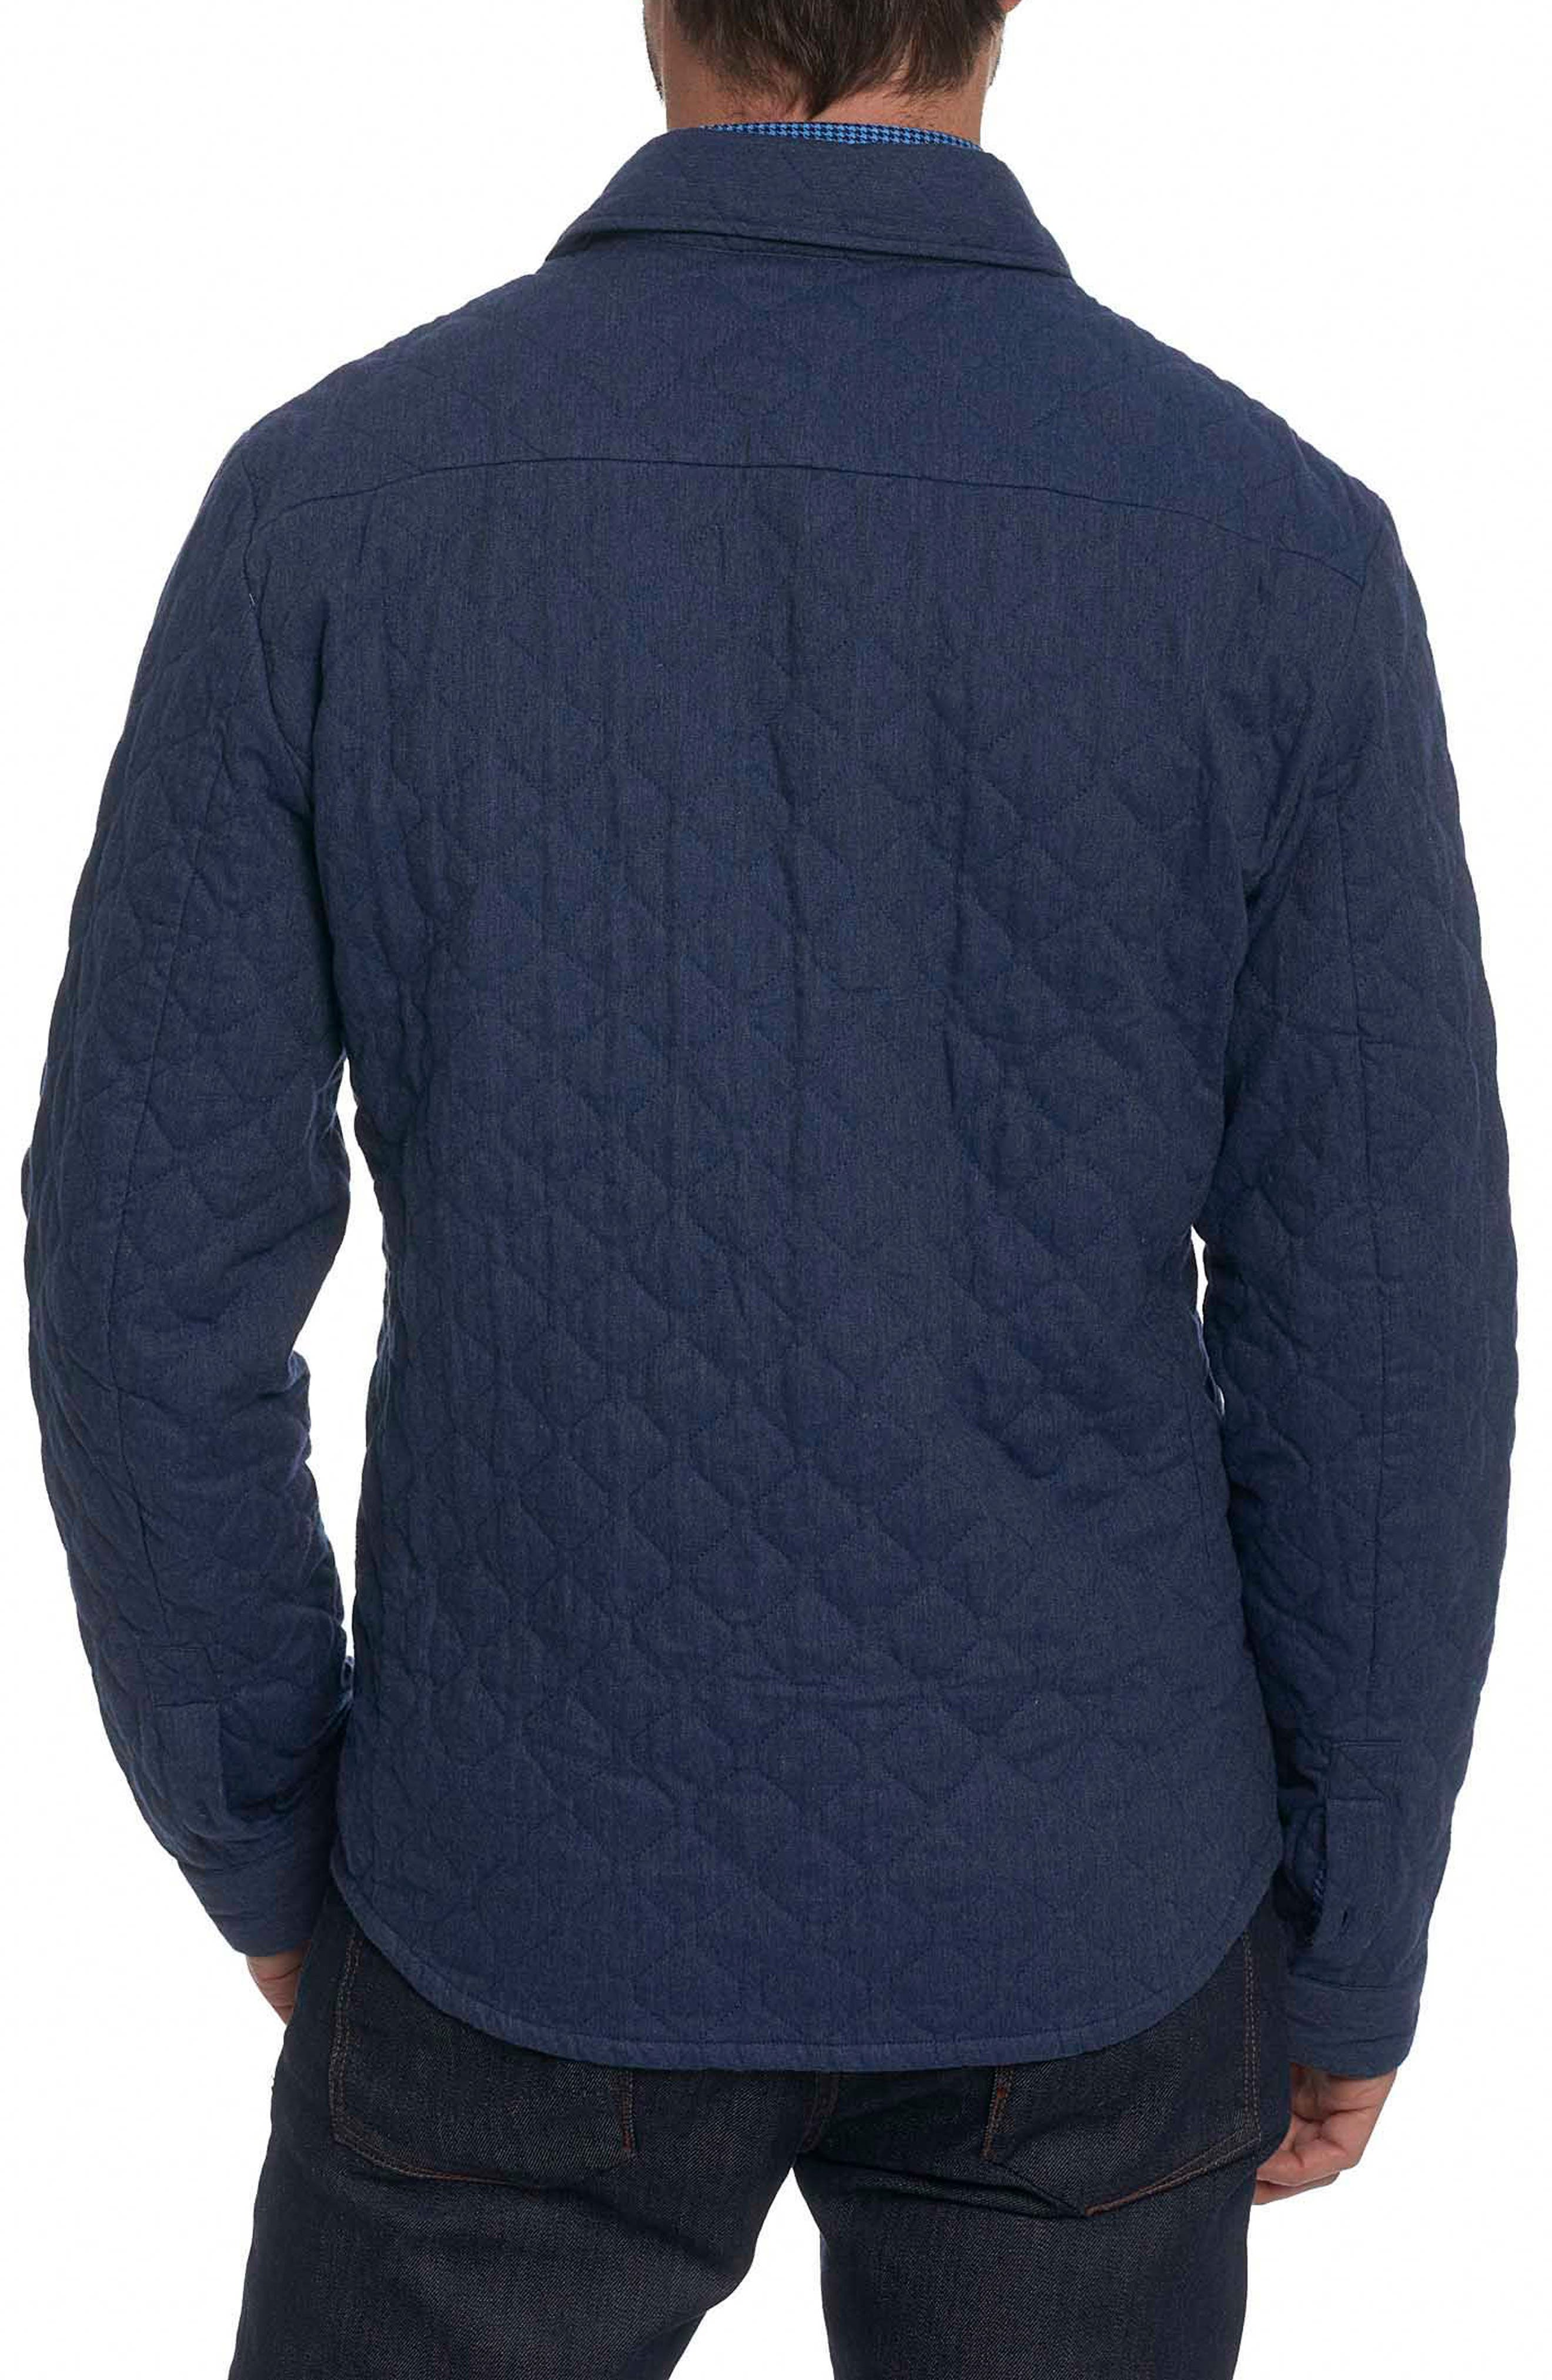 Alternate Image 2  - Robert Graham Lance Quilted Shirt Jacket